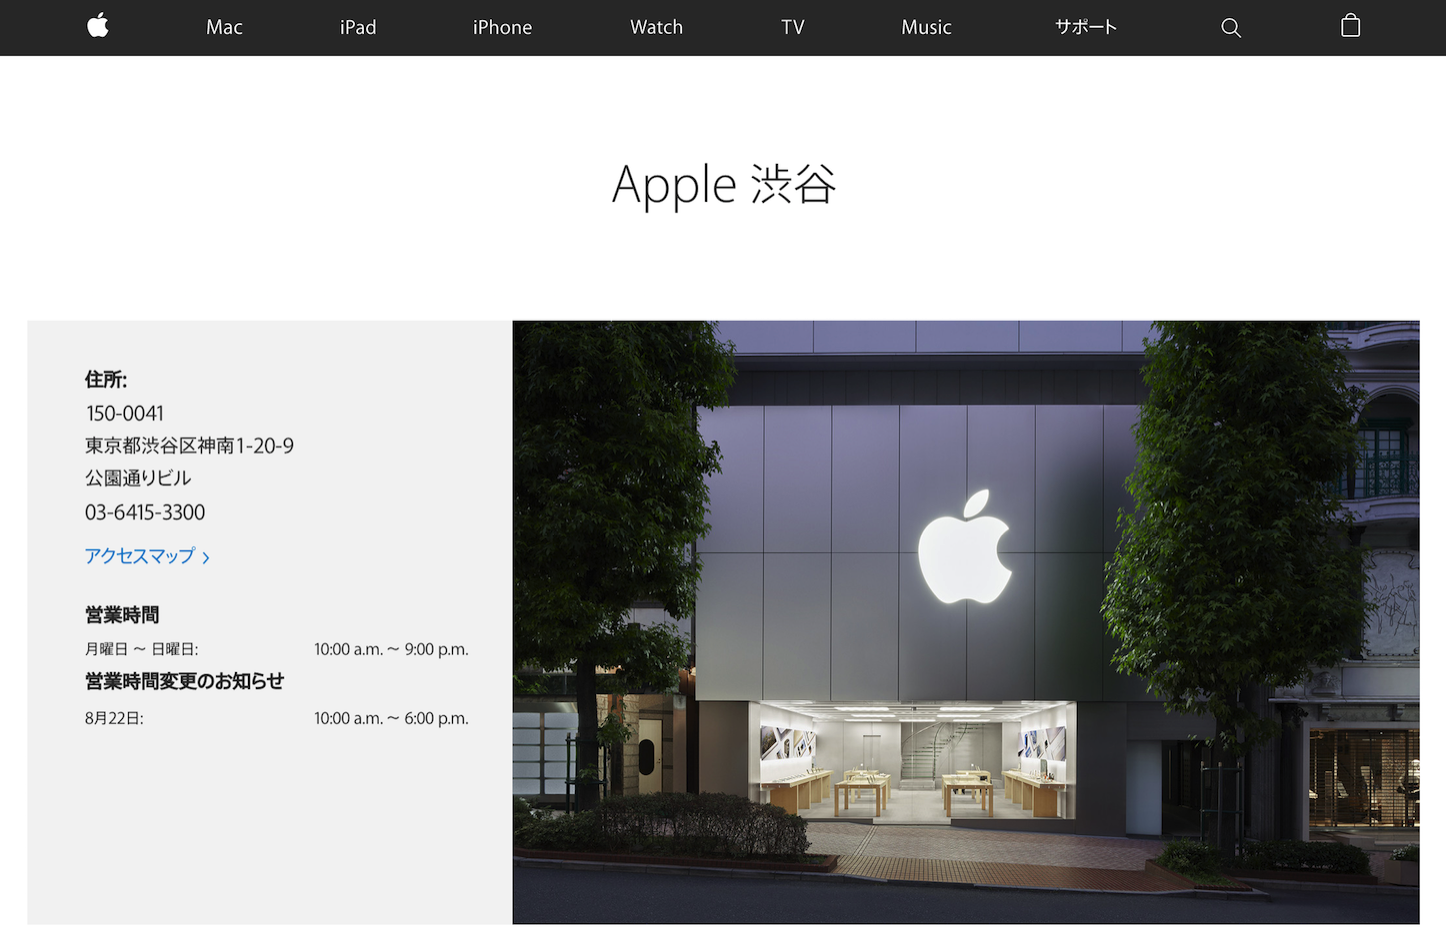 Apple-Shibuya.png